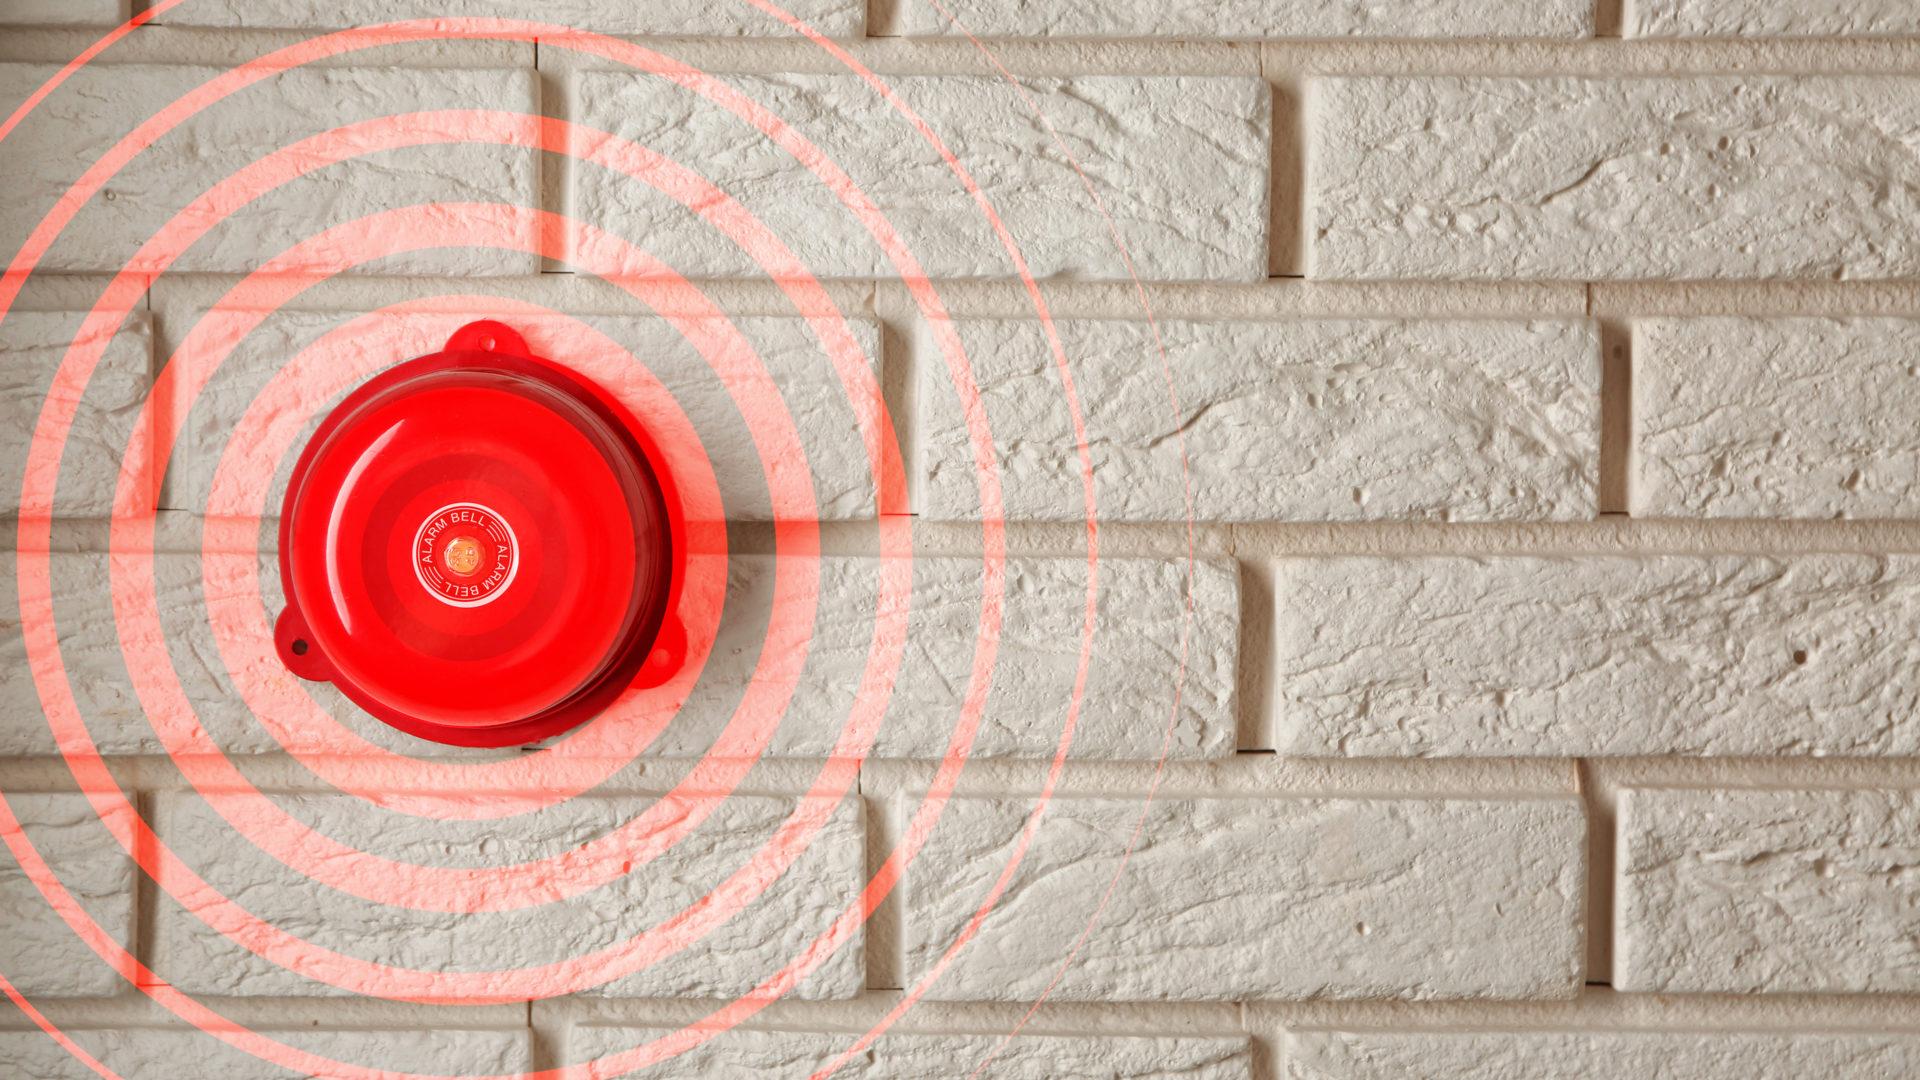 Ringing alarm bell on brick wall indoors